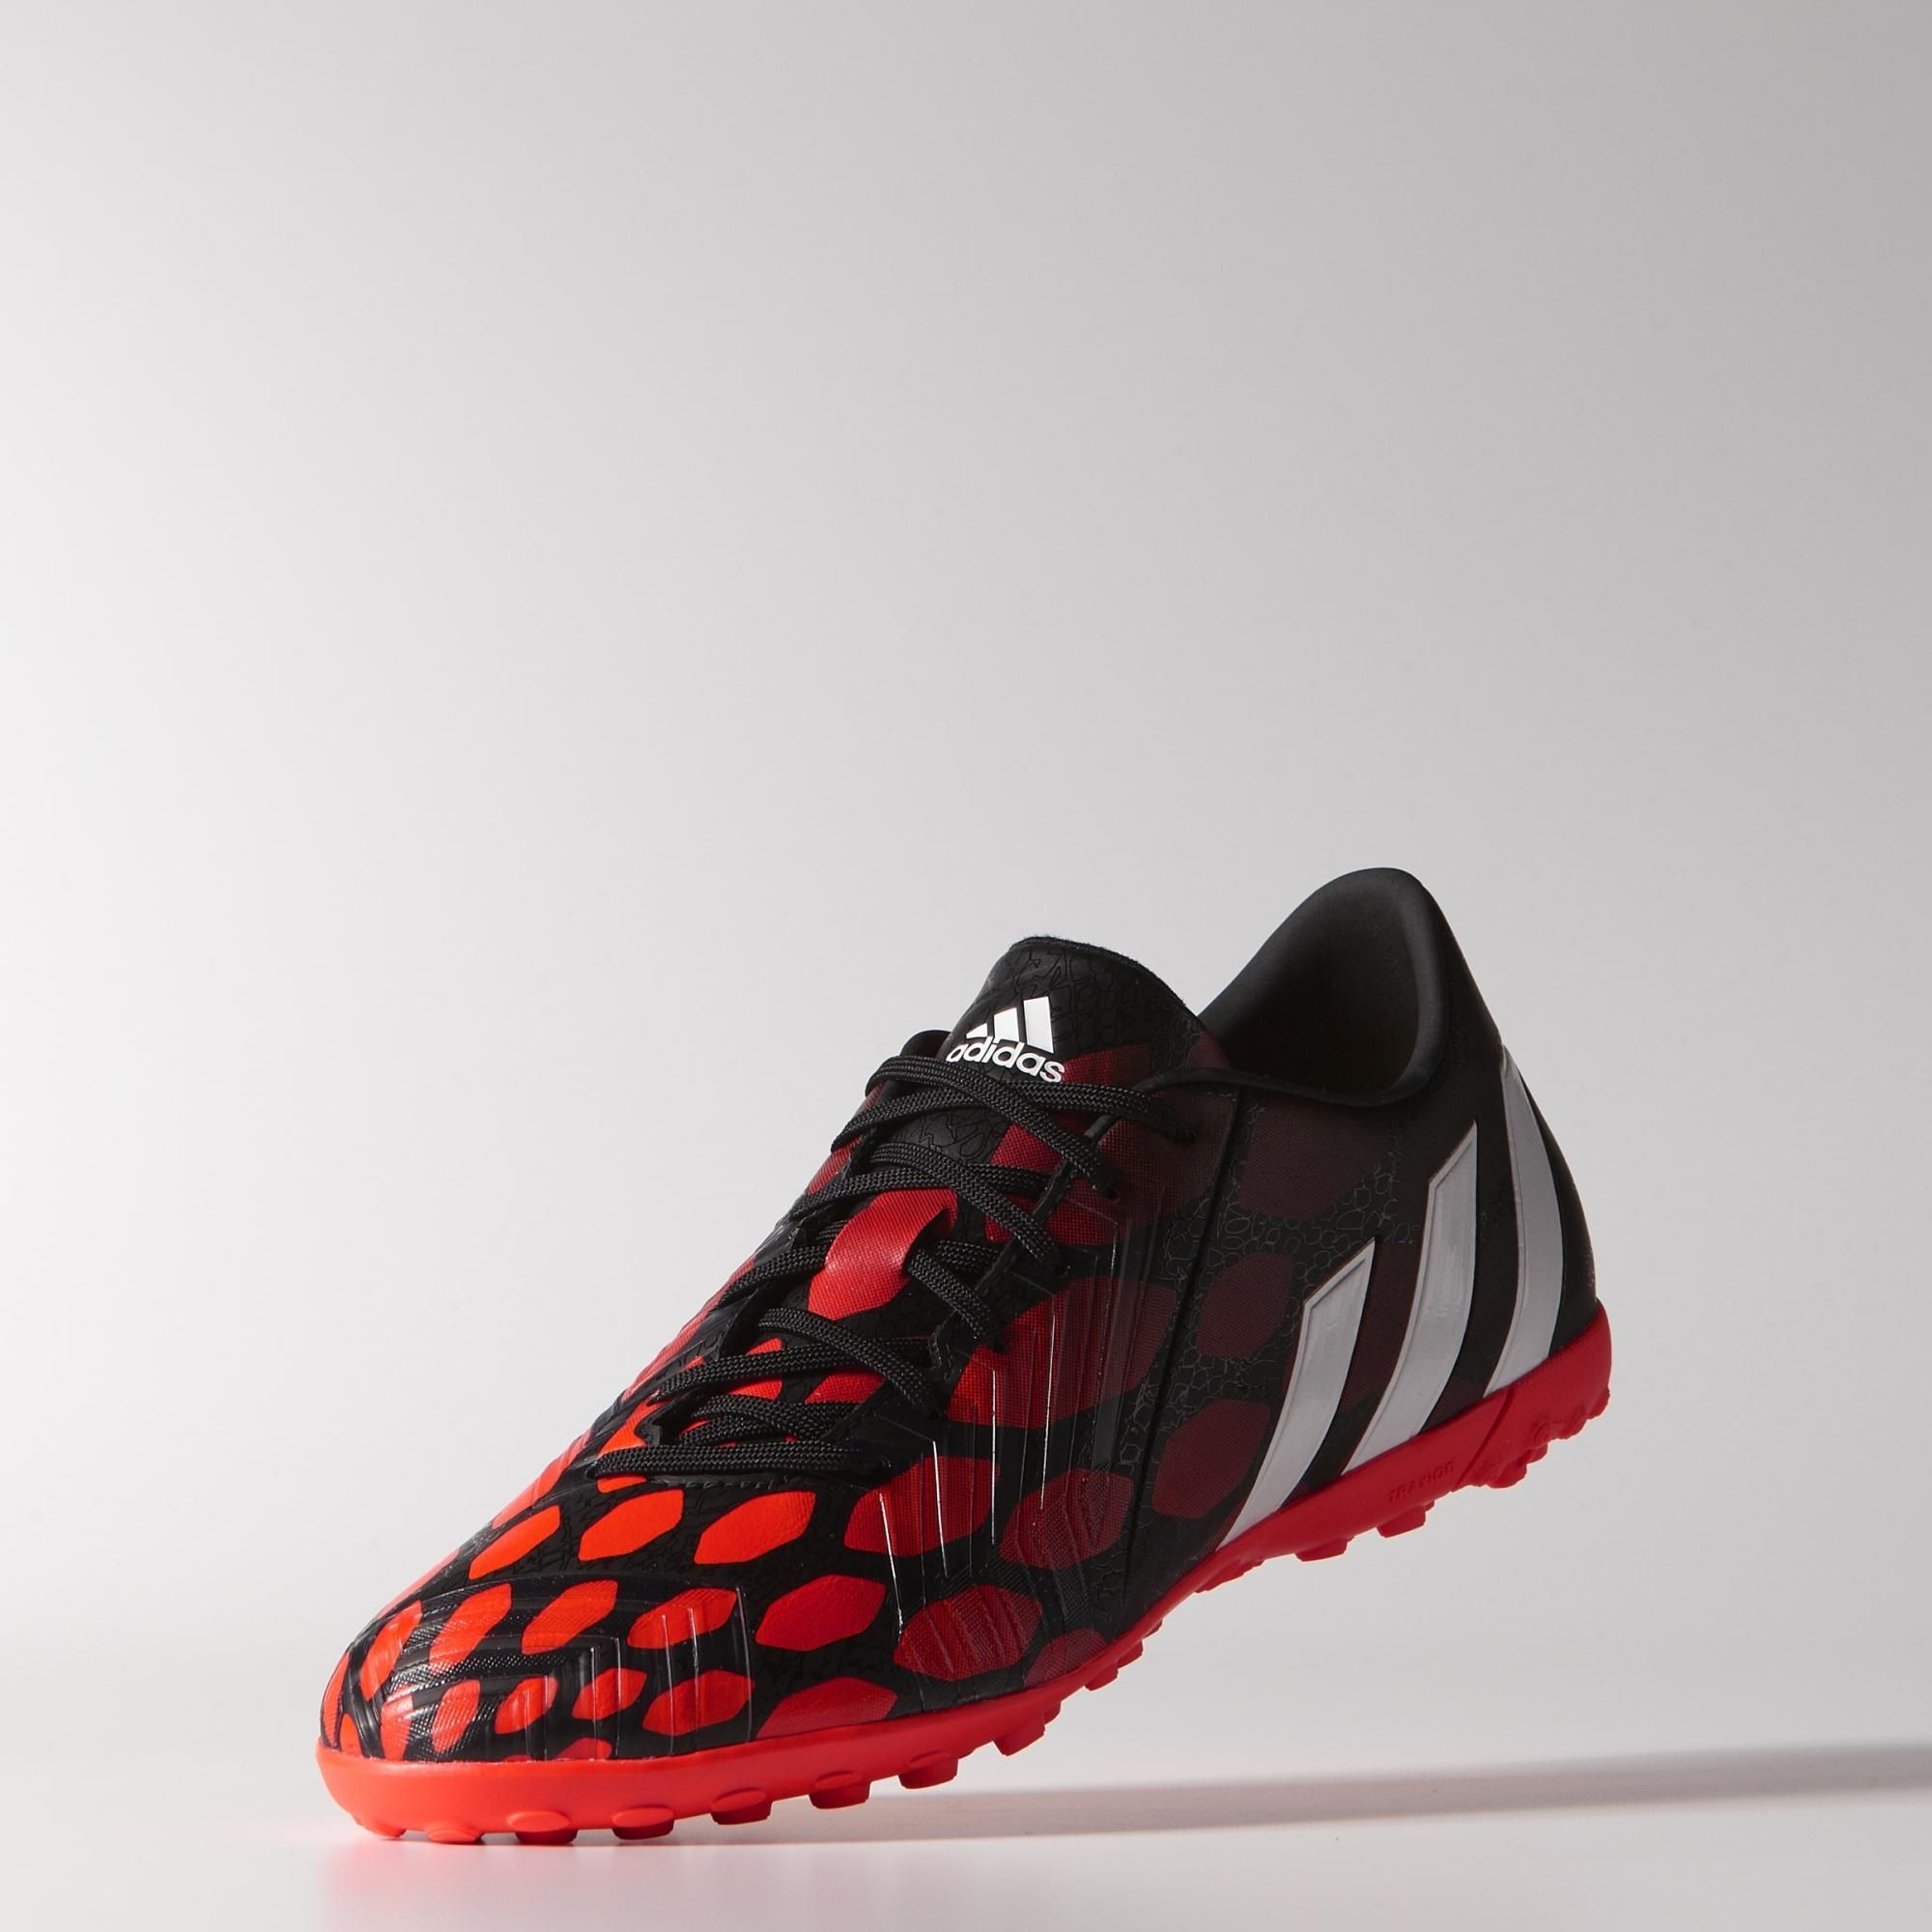 2cbb4d9c0b47 Adidas Predator Absolado Instinct TF Shoes - Core Black   Core White    Solar Red